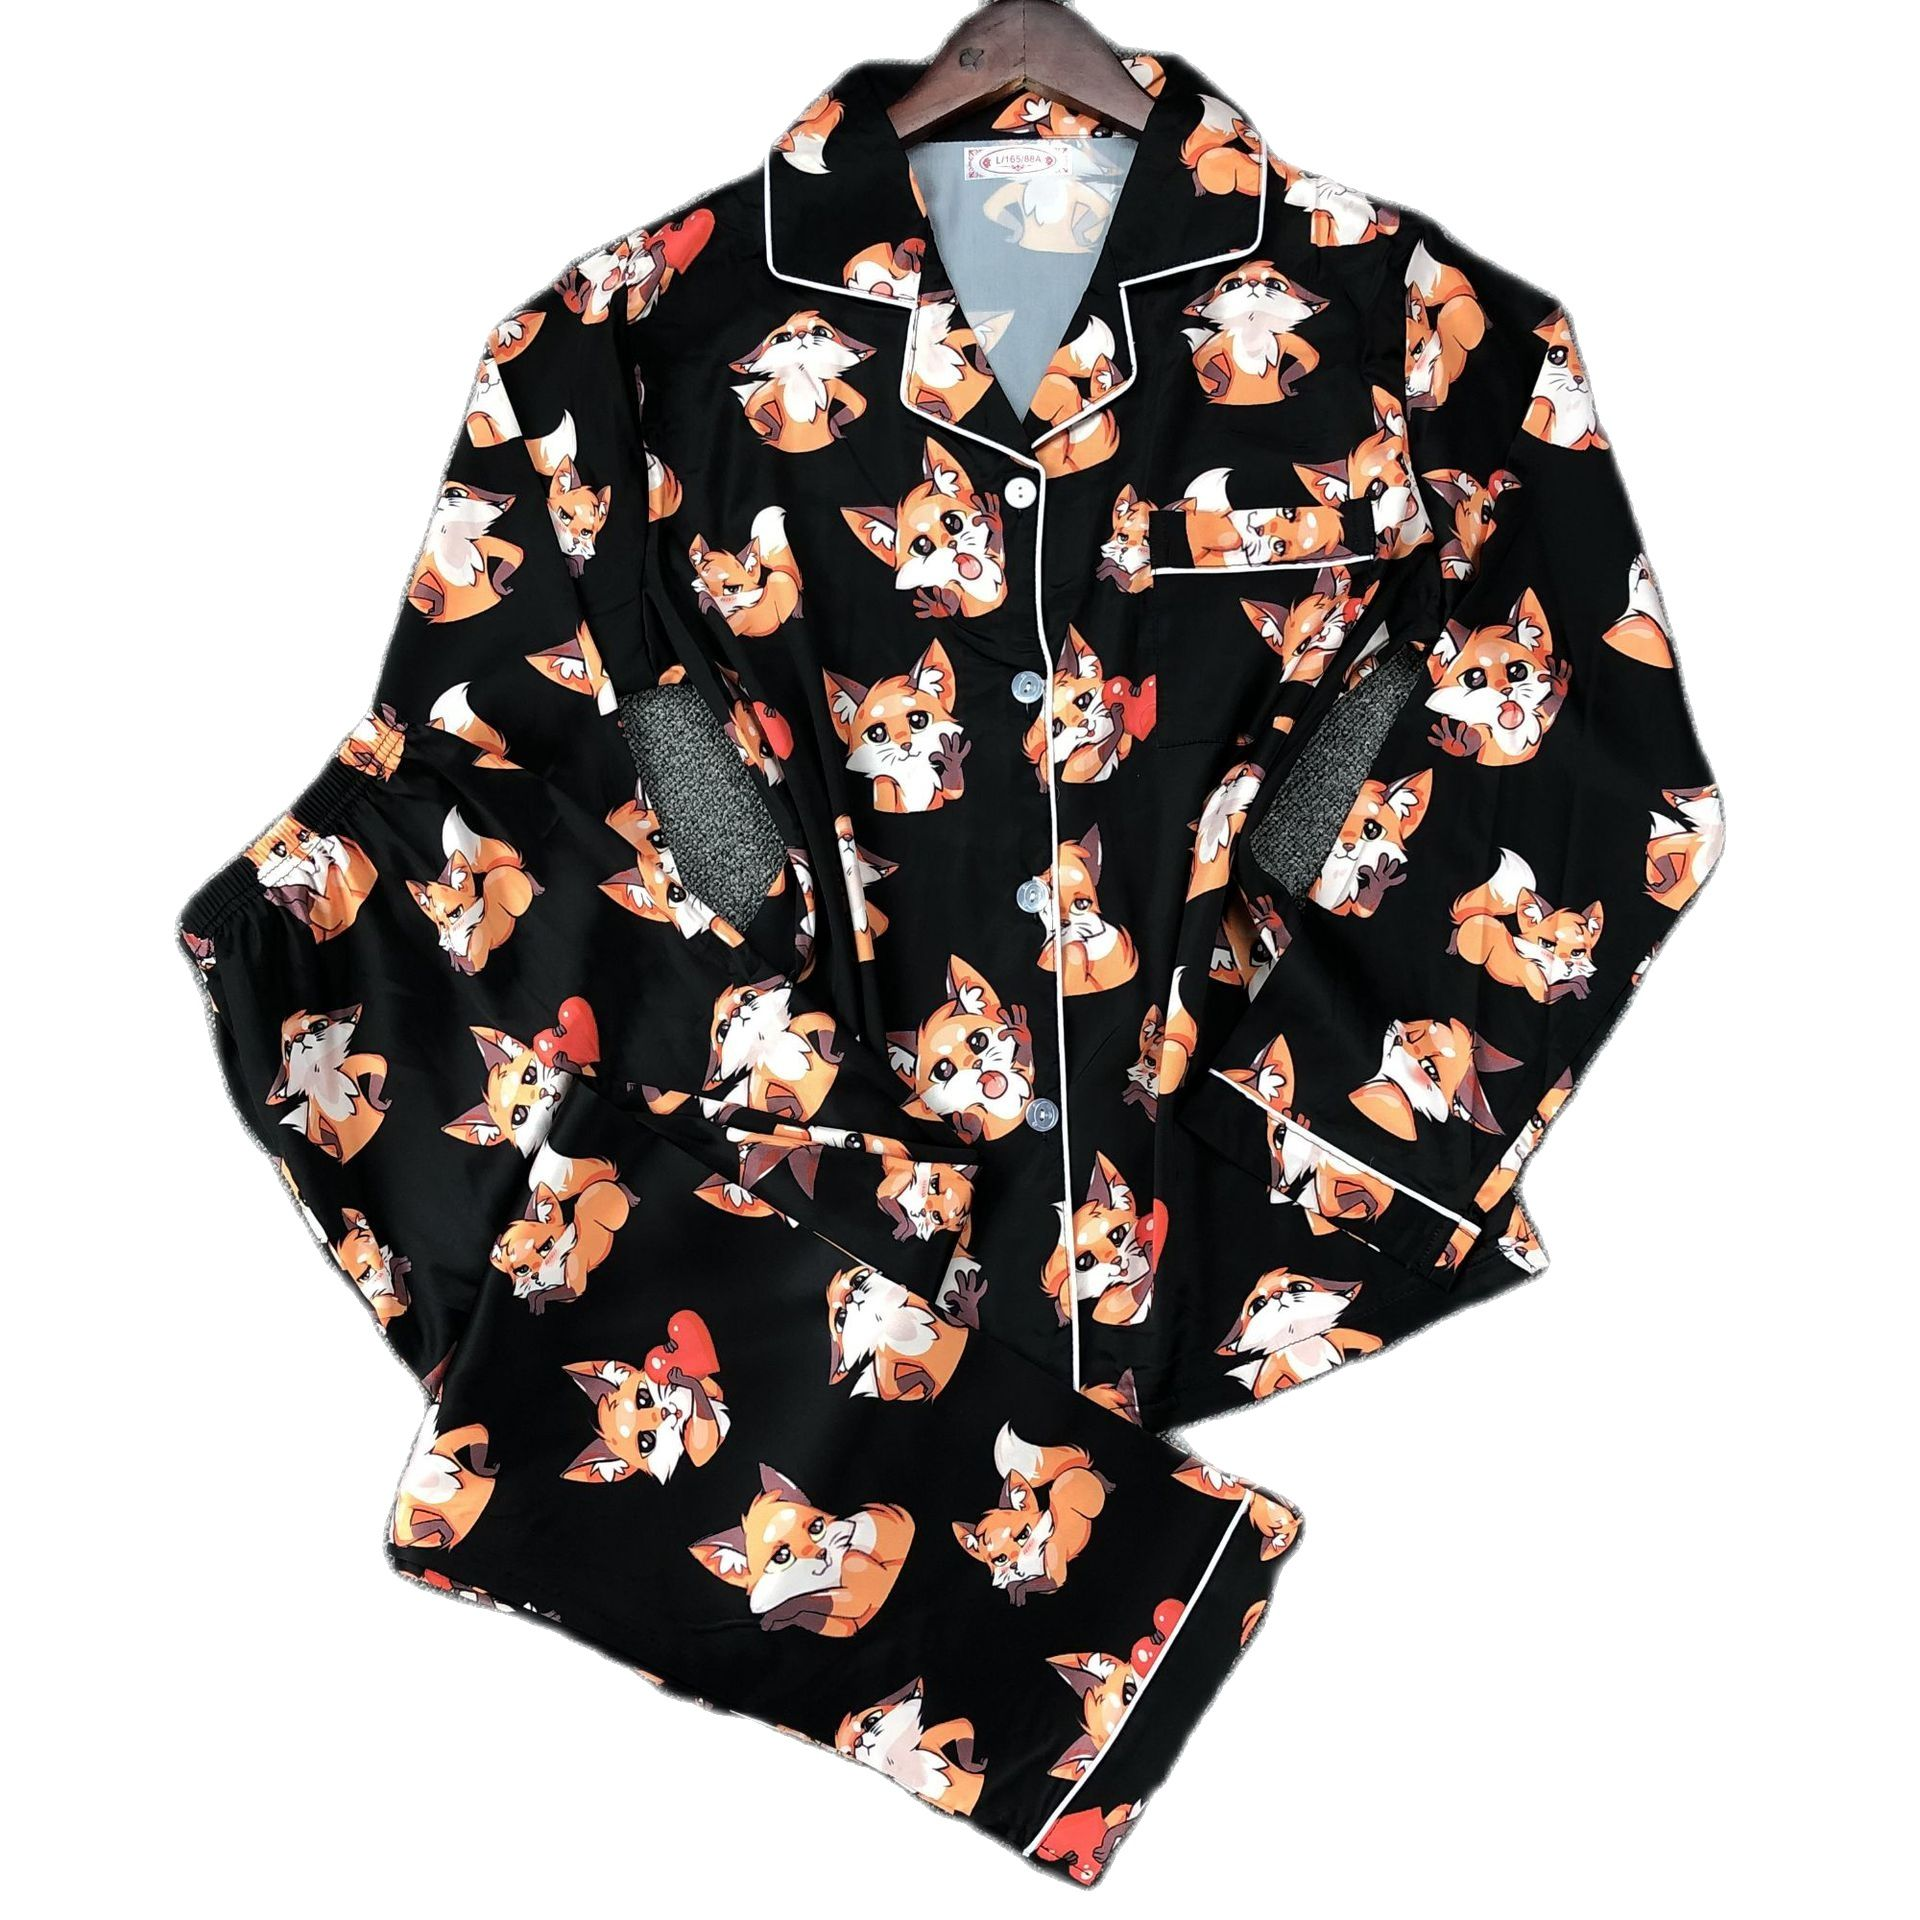 sleepwear cute kawaii pajama party set girls lounge bedroom two piece sets sleep tops teen girl women long pantsCartoon pattern